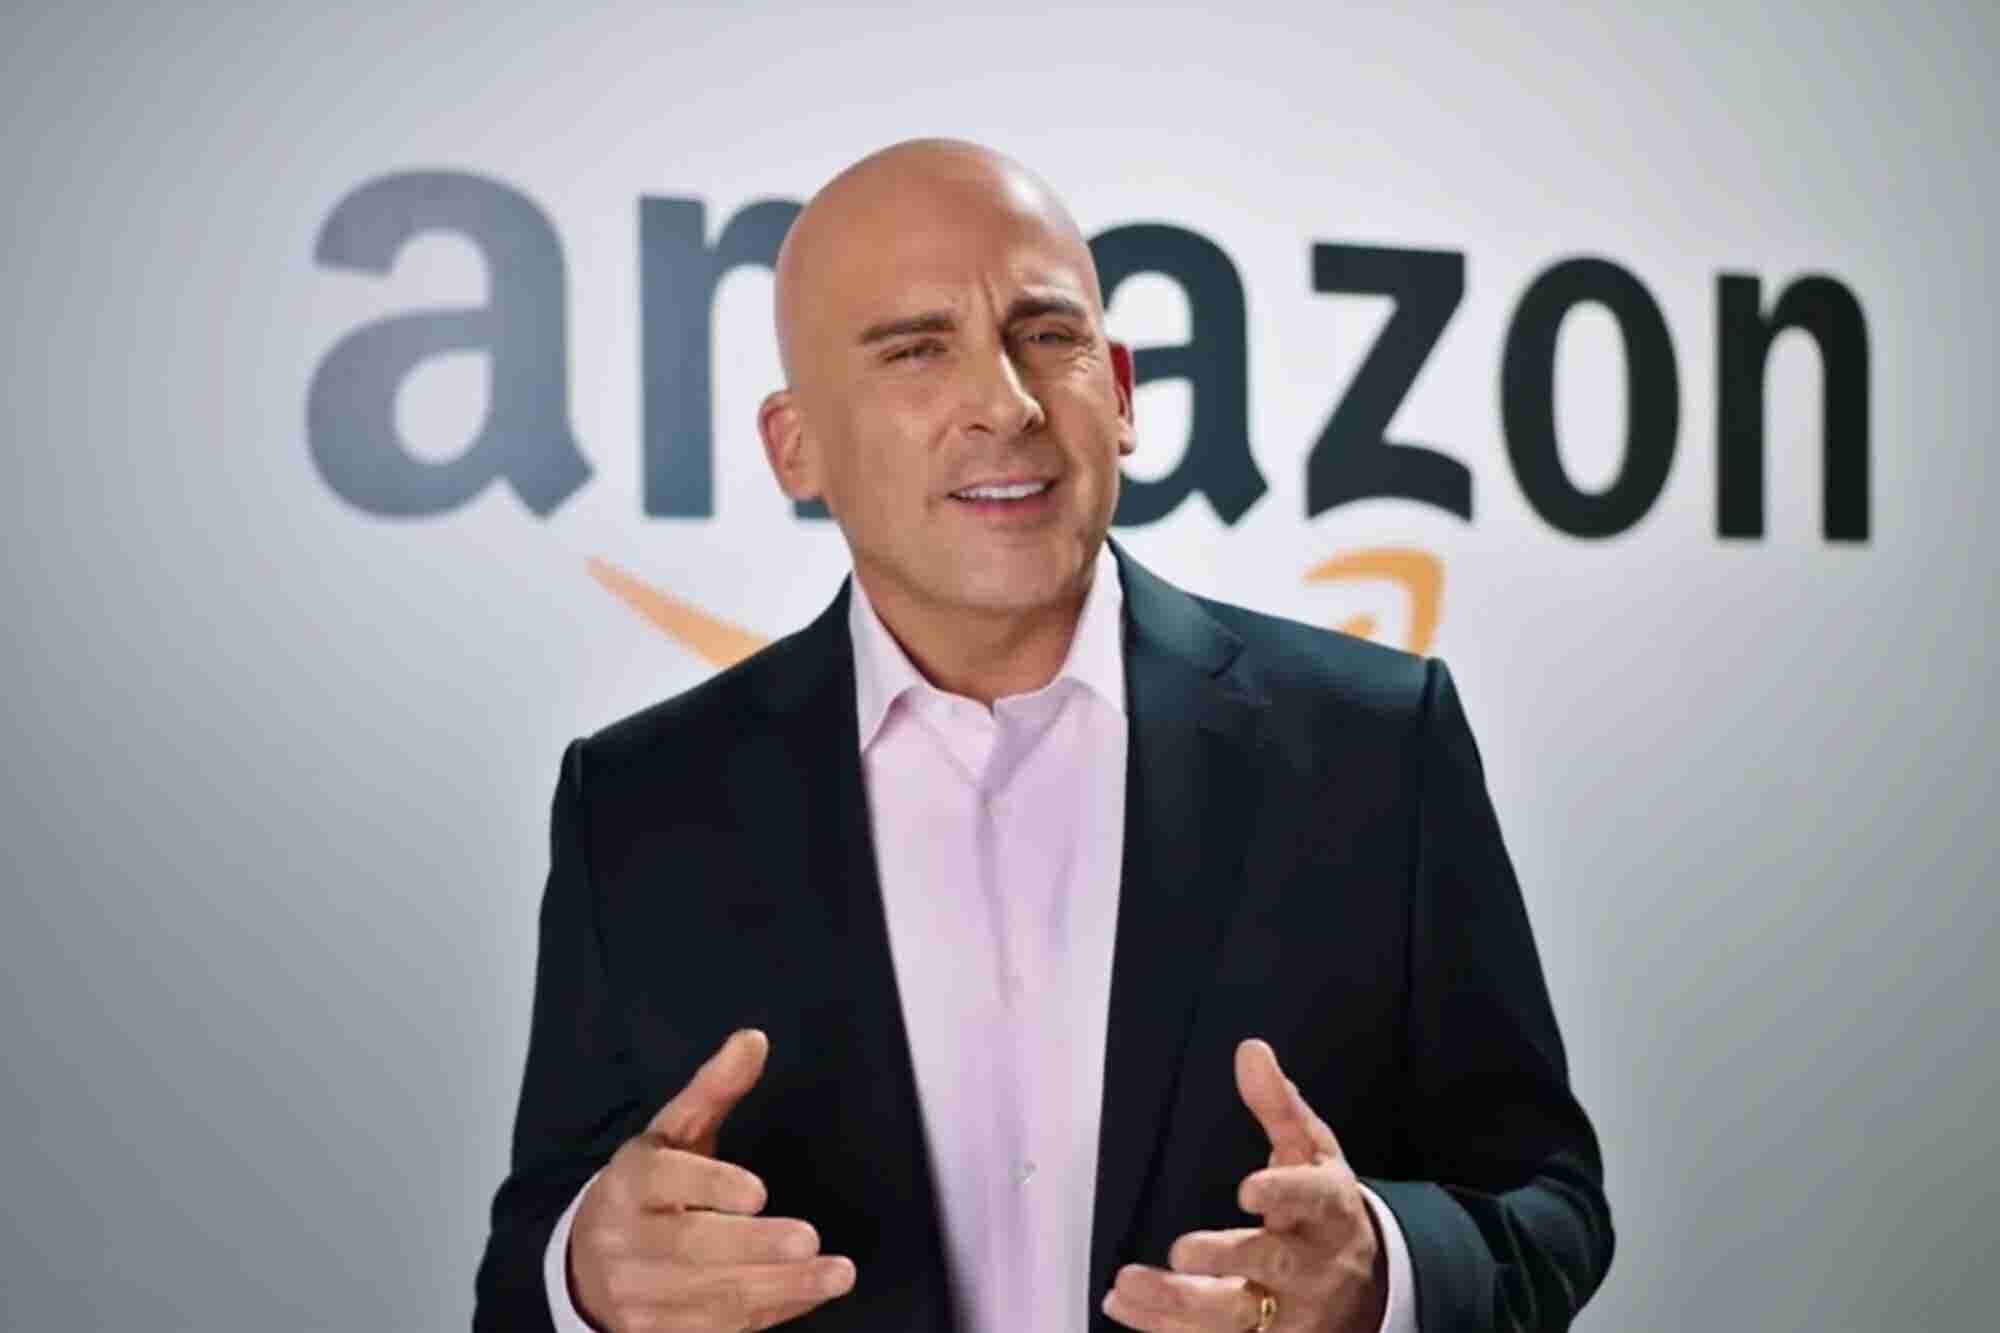 Amazon's Jeff Bezos Gets the SNL Treatment